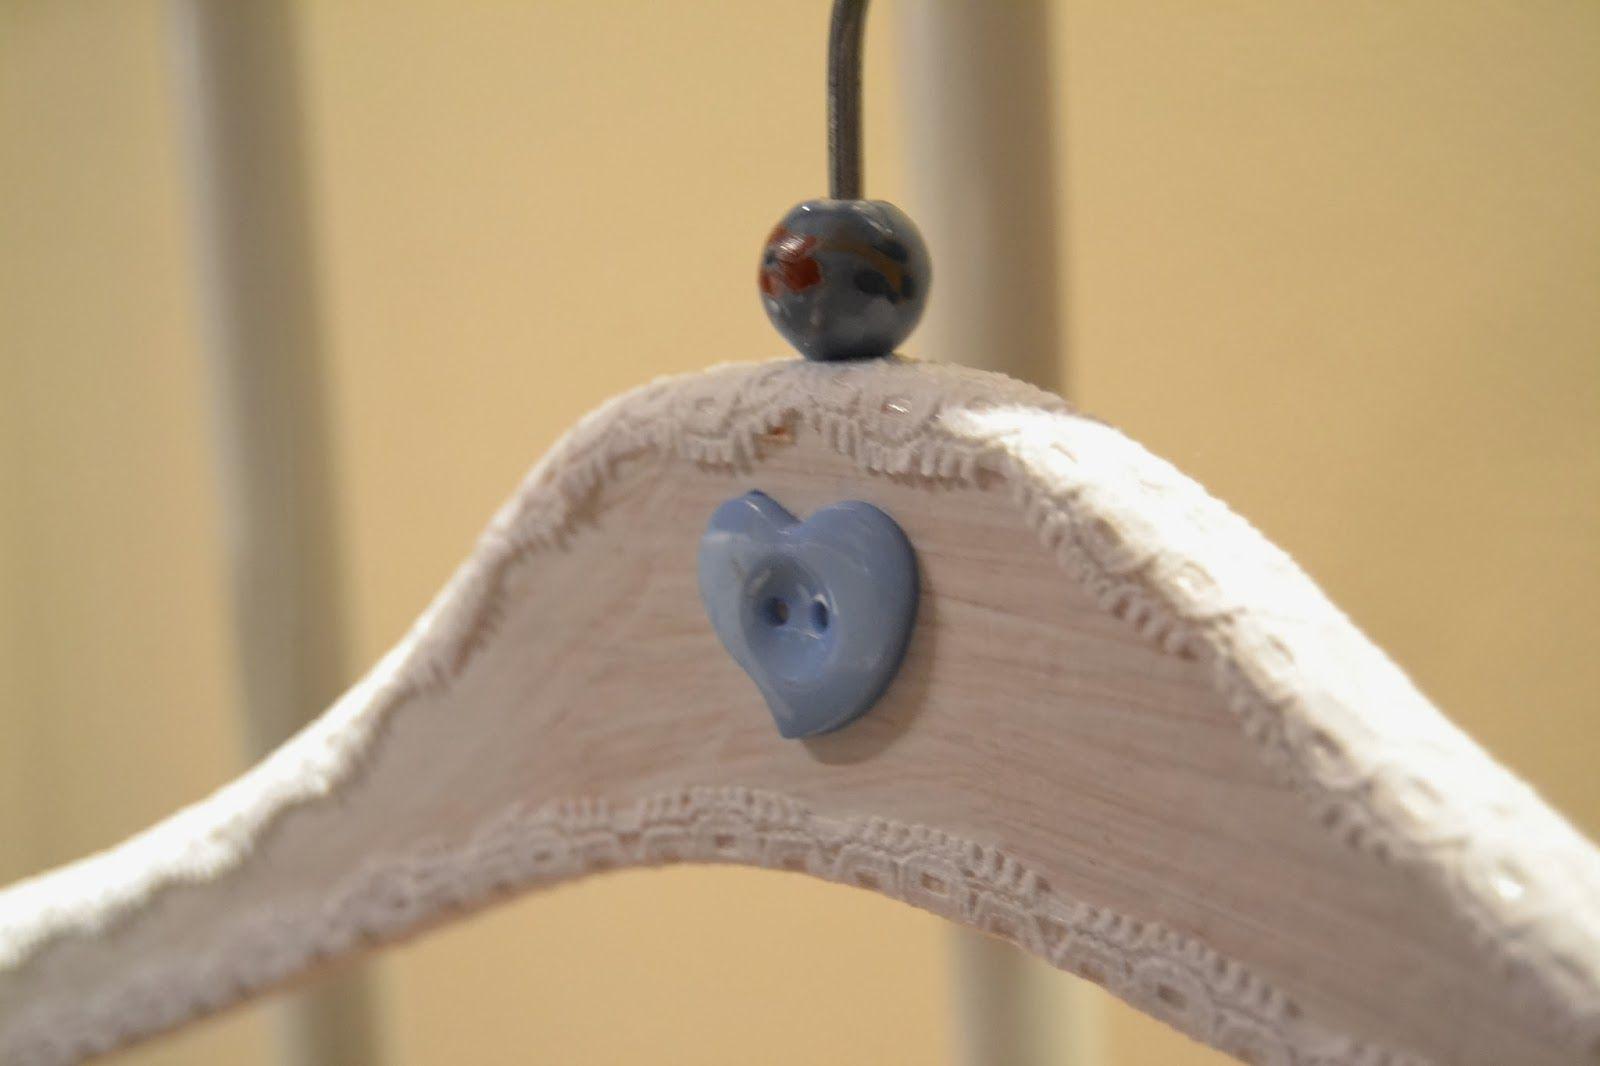 Taller de Restauración Lila: Perchas tuneadas y personalizadas